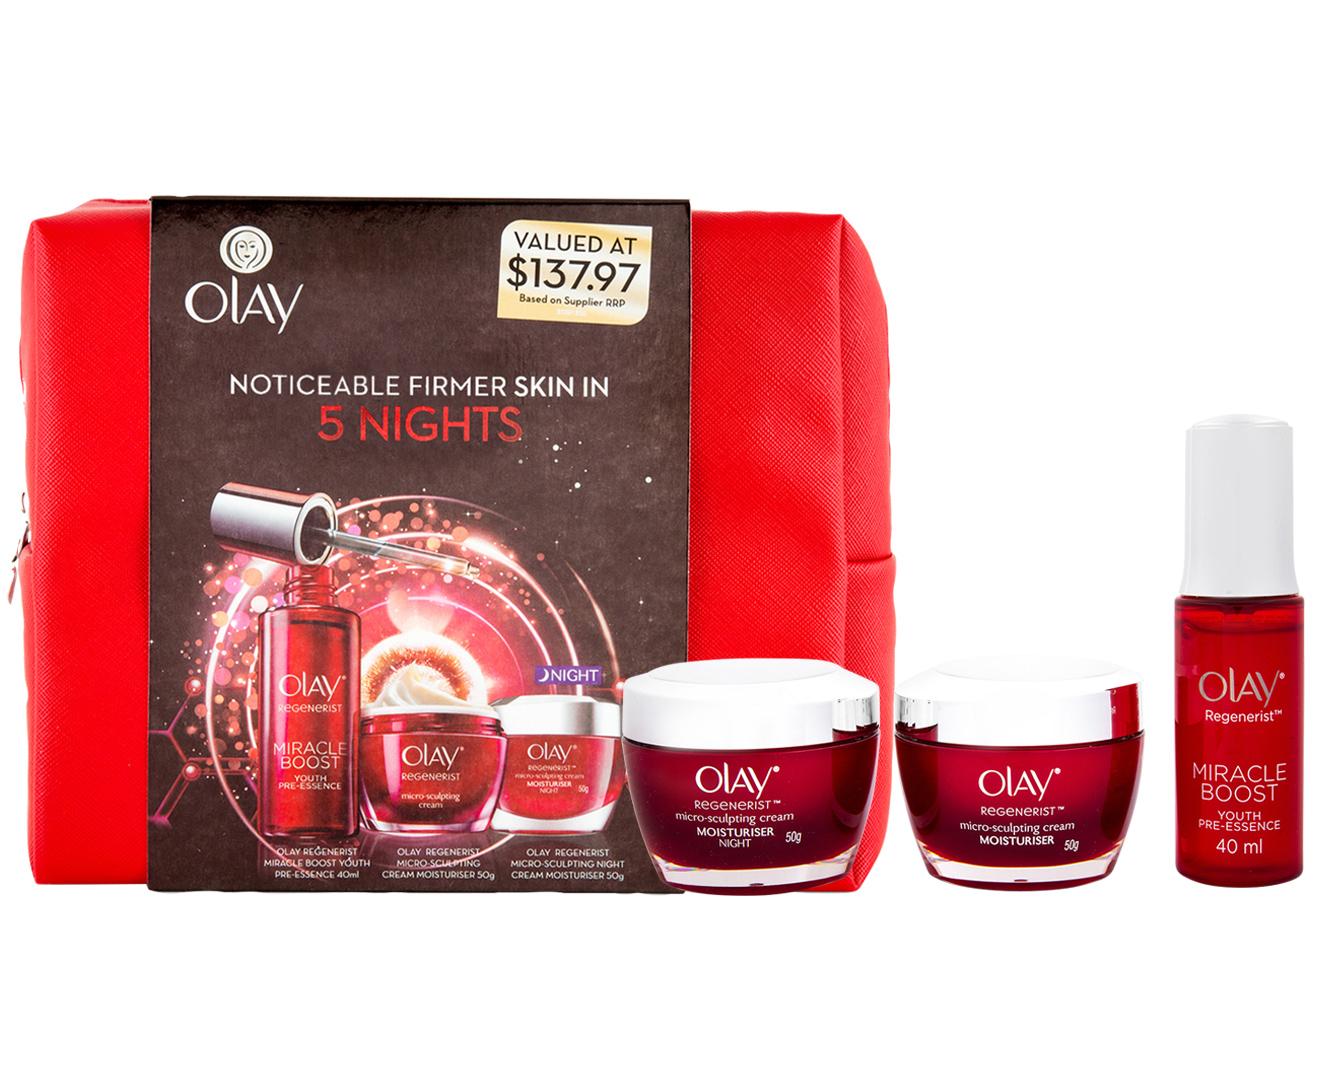 sc 1 st  Catch & Olay Youthful Skin Gift Pack | Catch.com.au